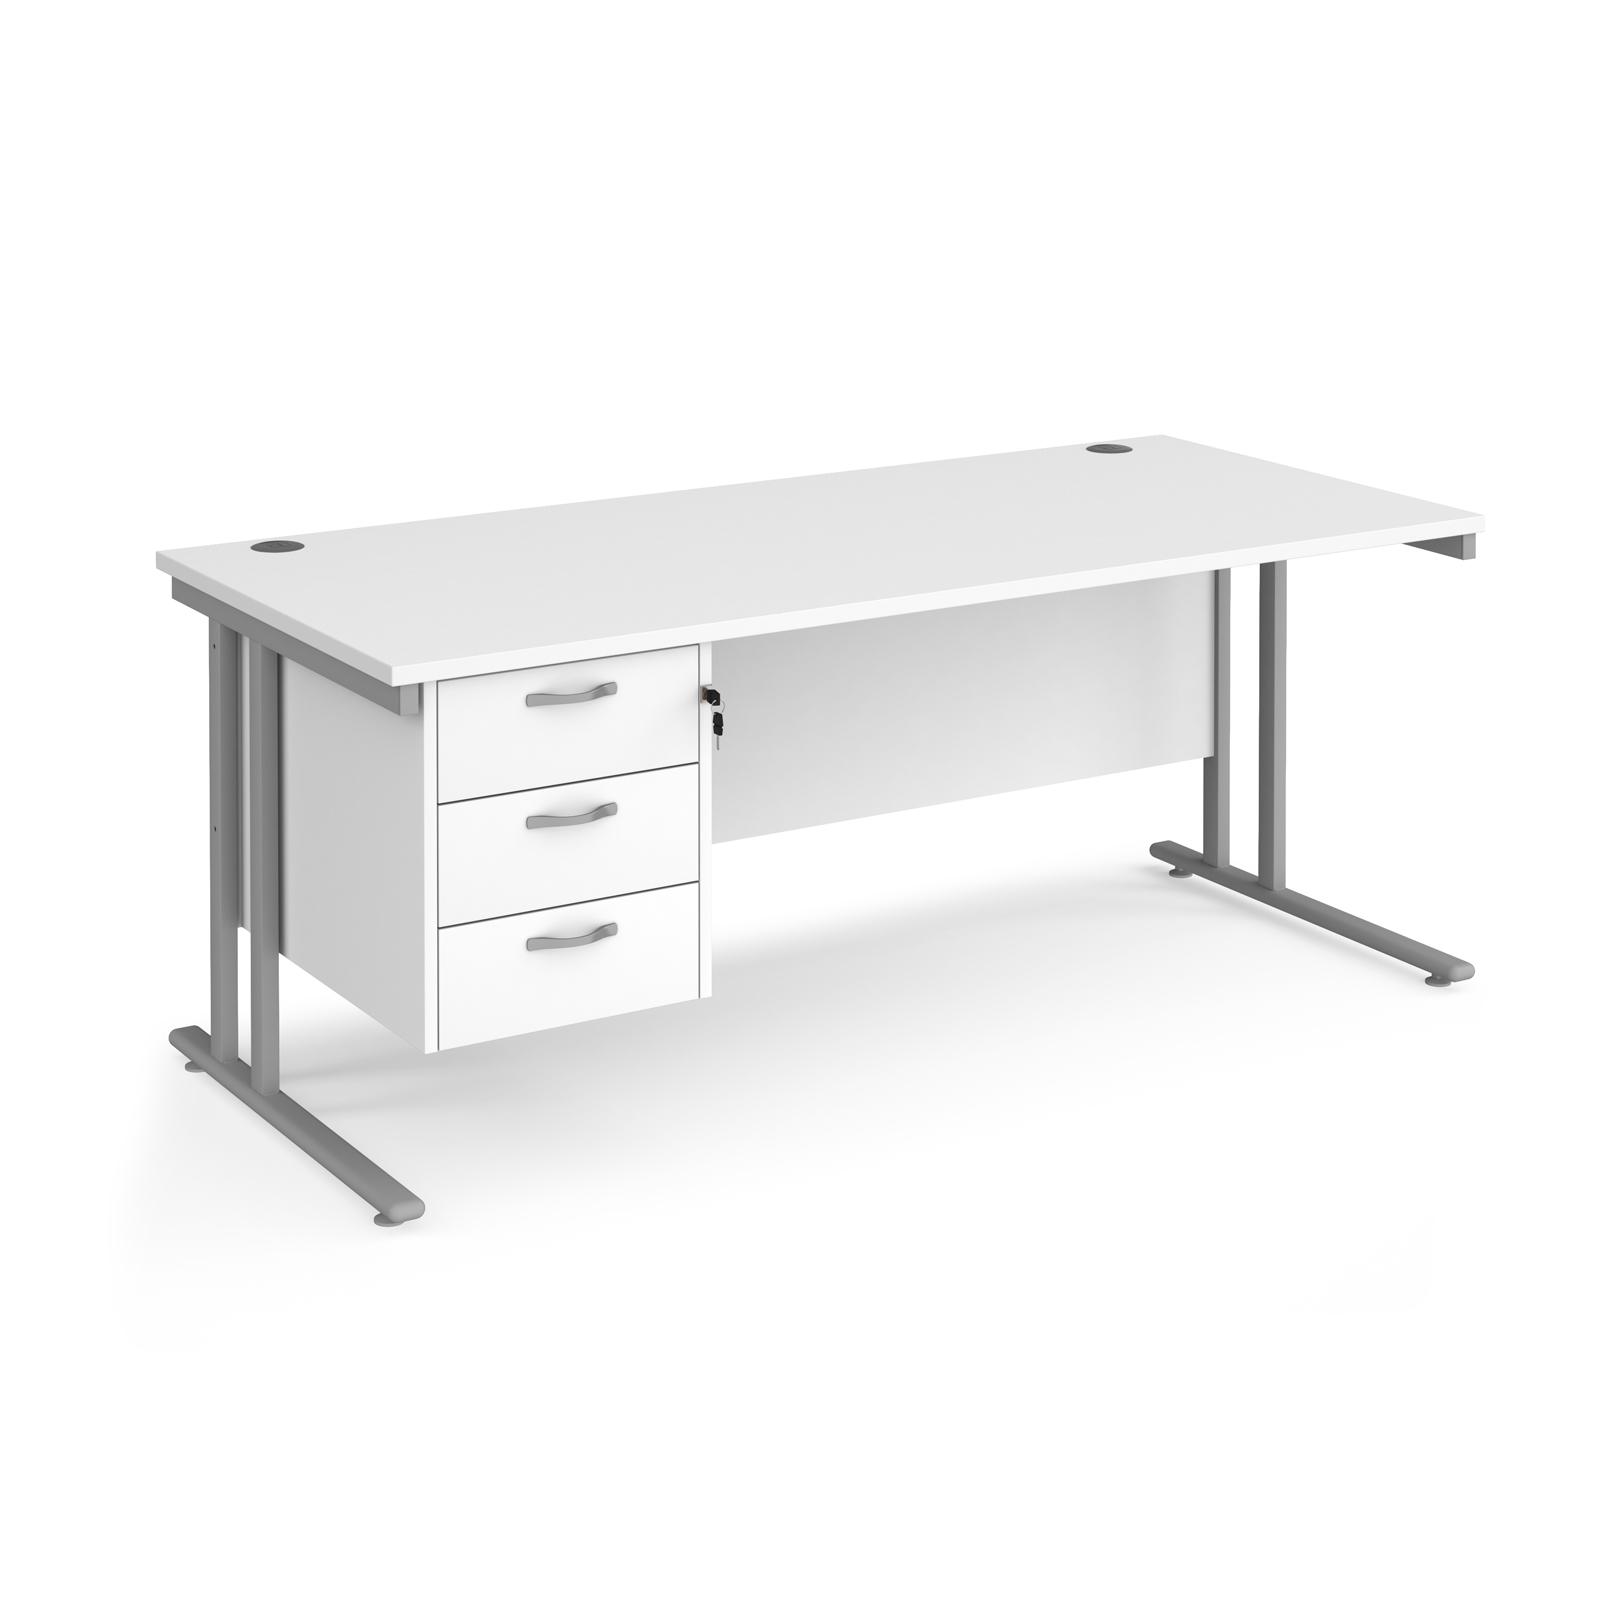 Rectangular Desks Maestro 25 straight desk 1800mm x 800mm with 3 drawer pedestal - silver cantilever leg frame, white top